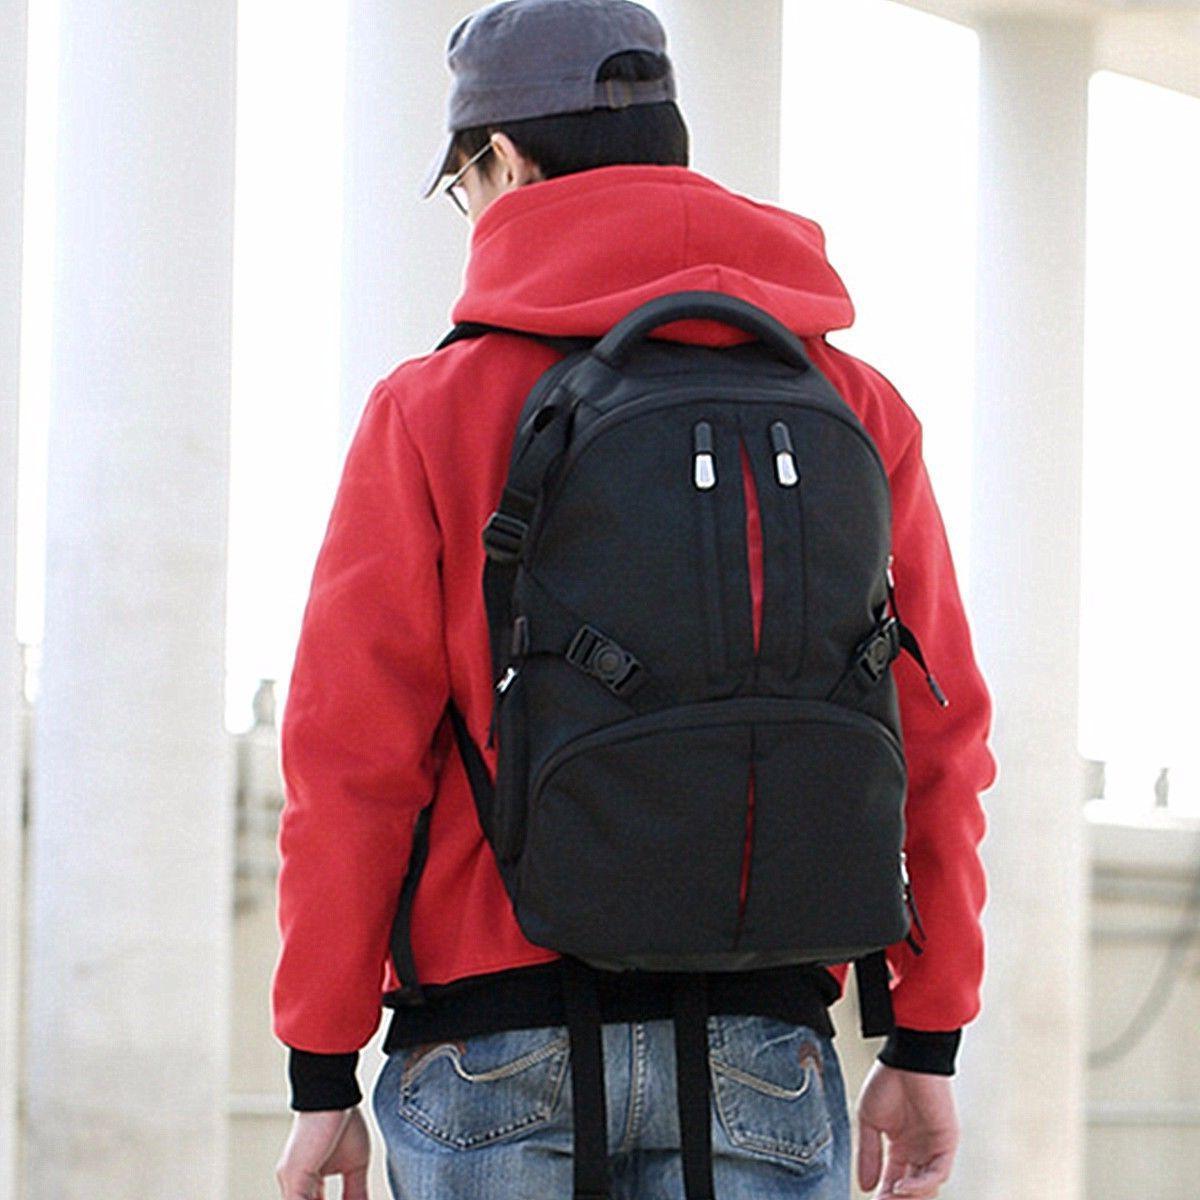 Waterproof SLR DSLR Camera Laptop Bag Backpack Rucksack